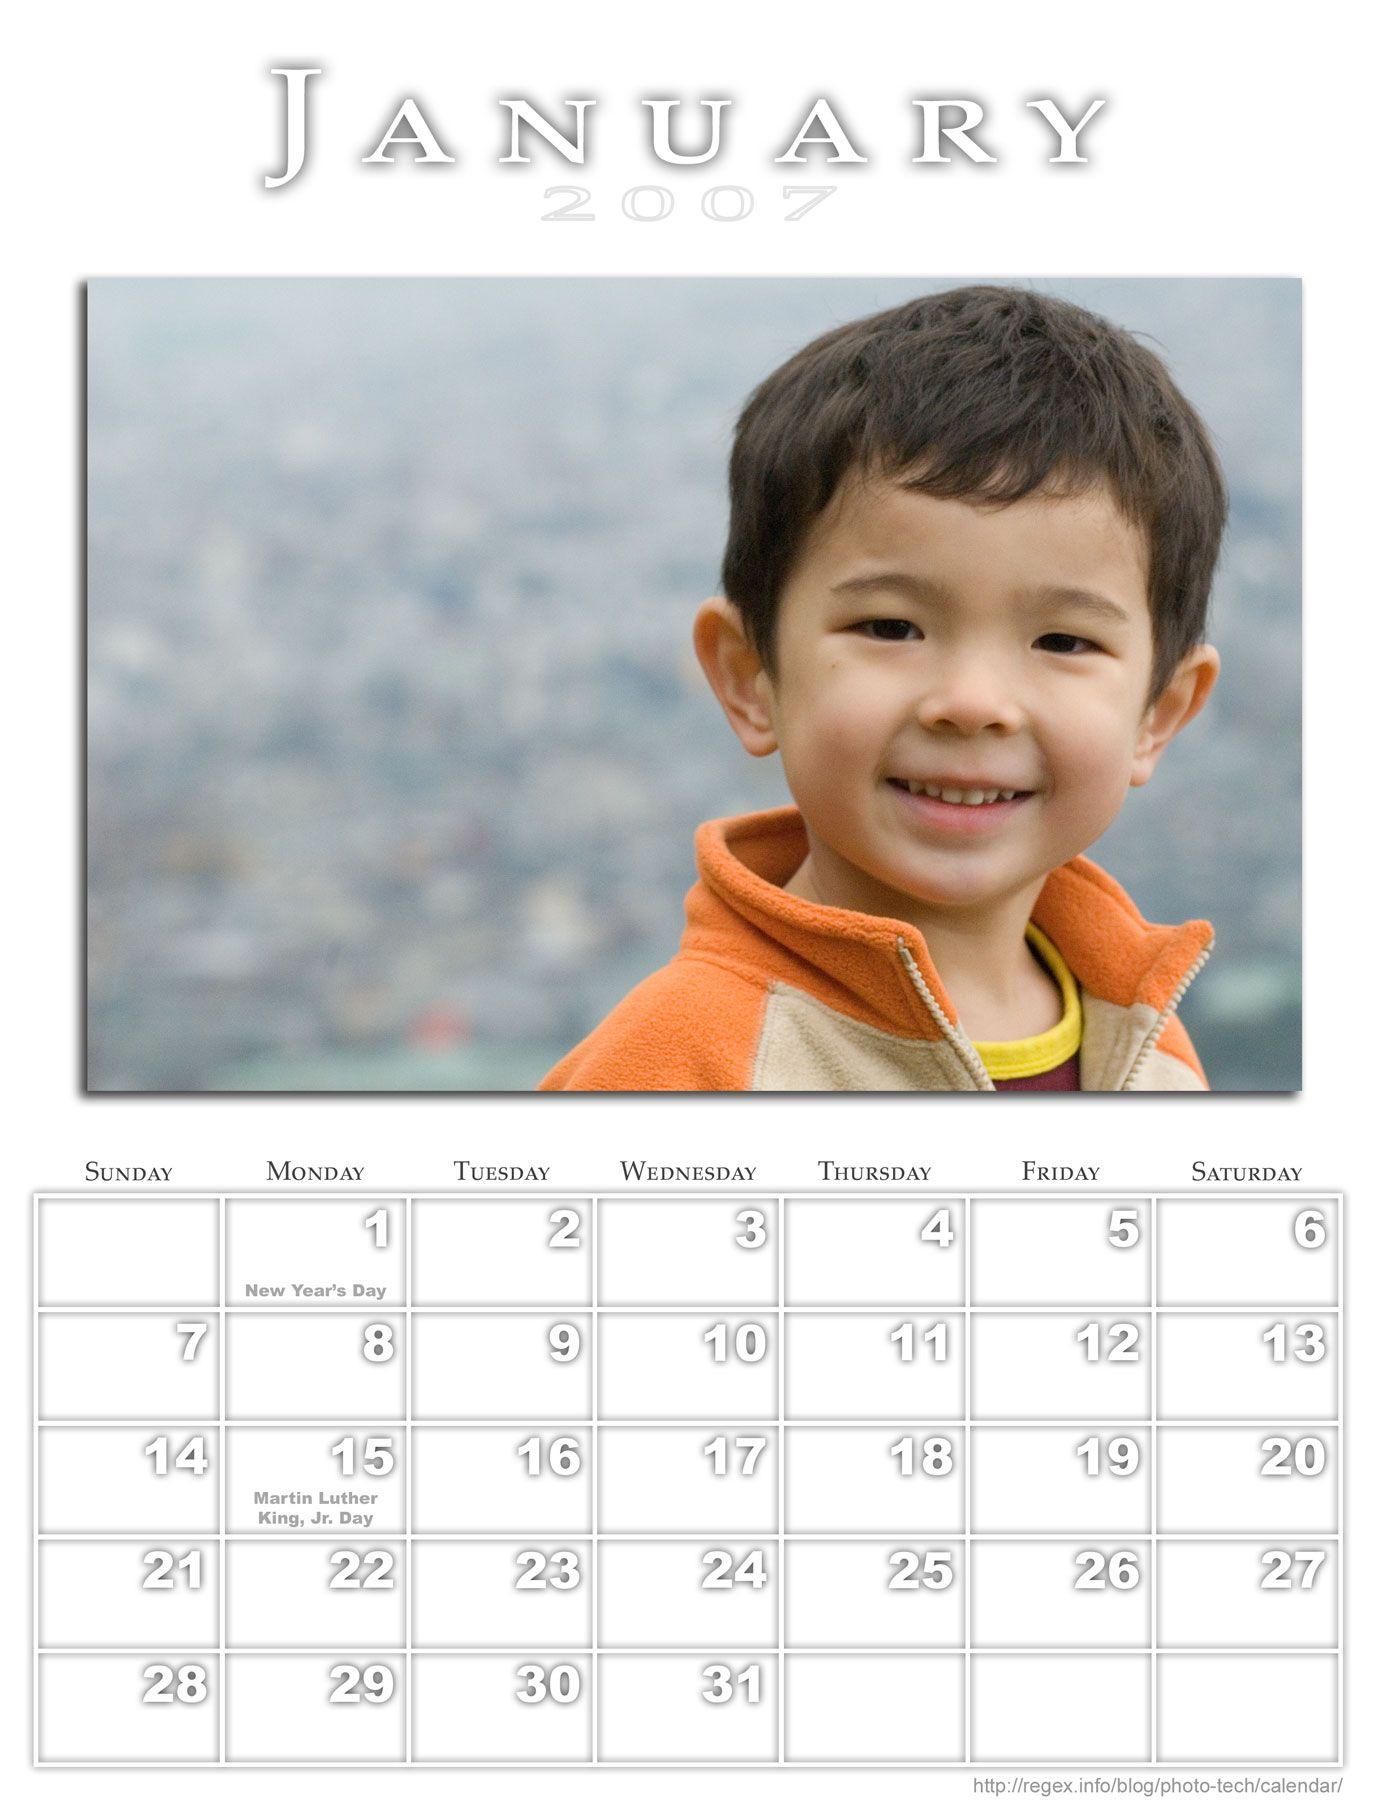 Pin By Rebecca Jeanne On Photo Stuff | Photoshop, Photo regarding Script Calendario Photoshop